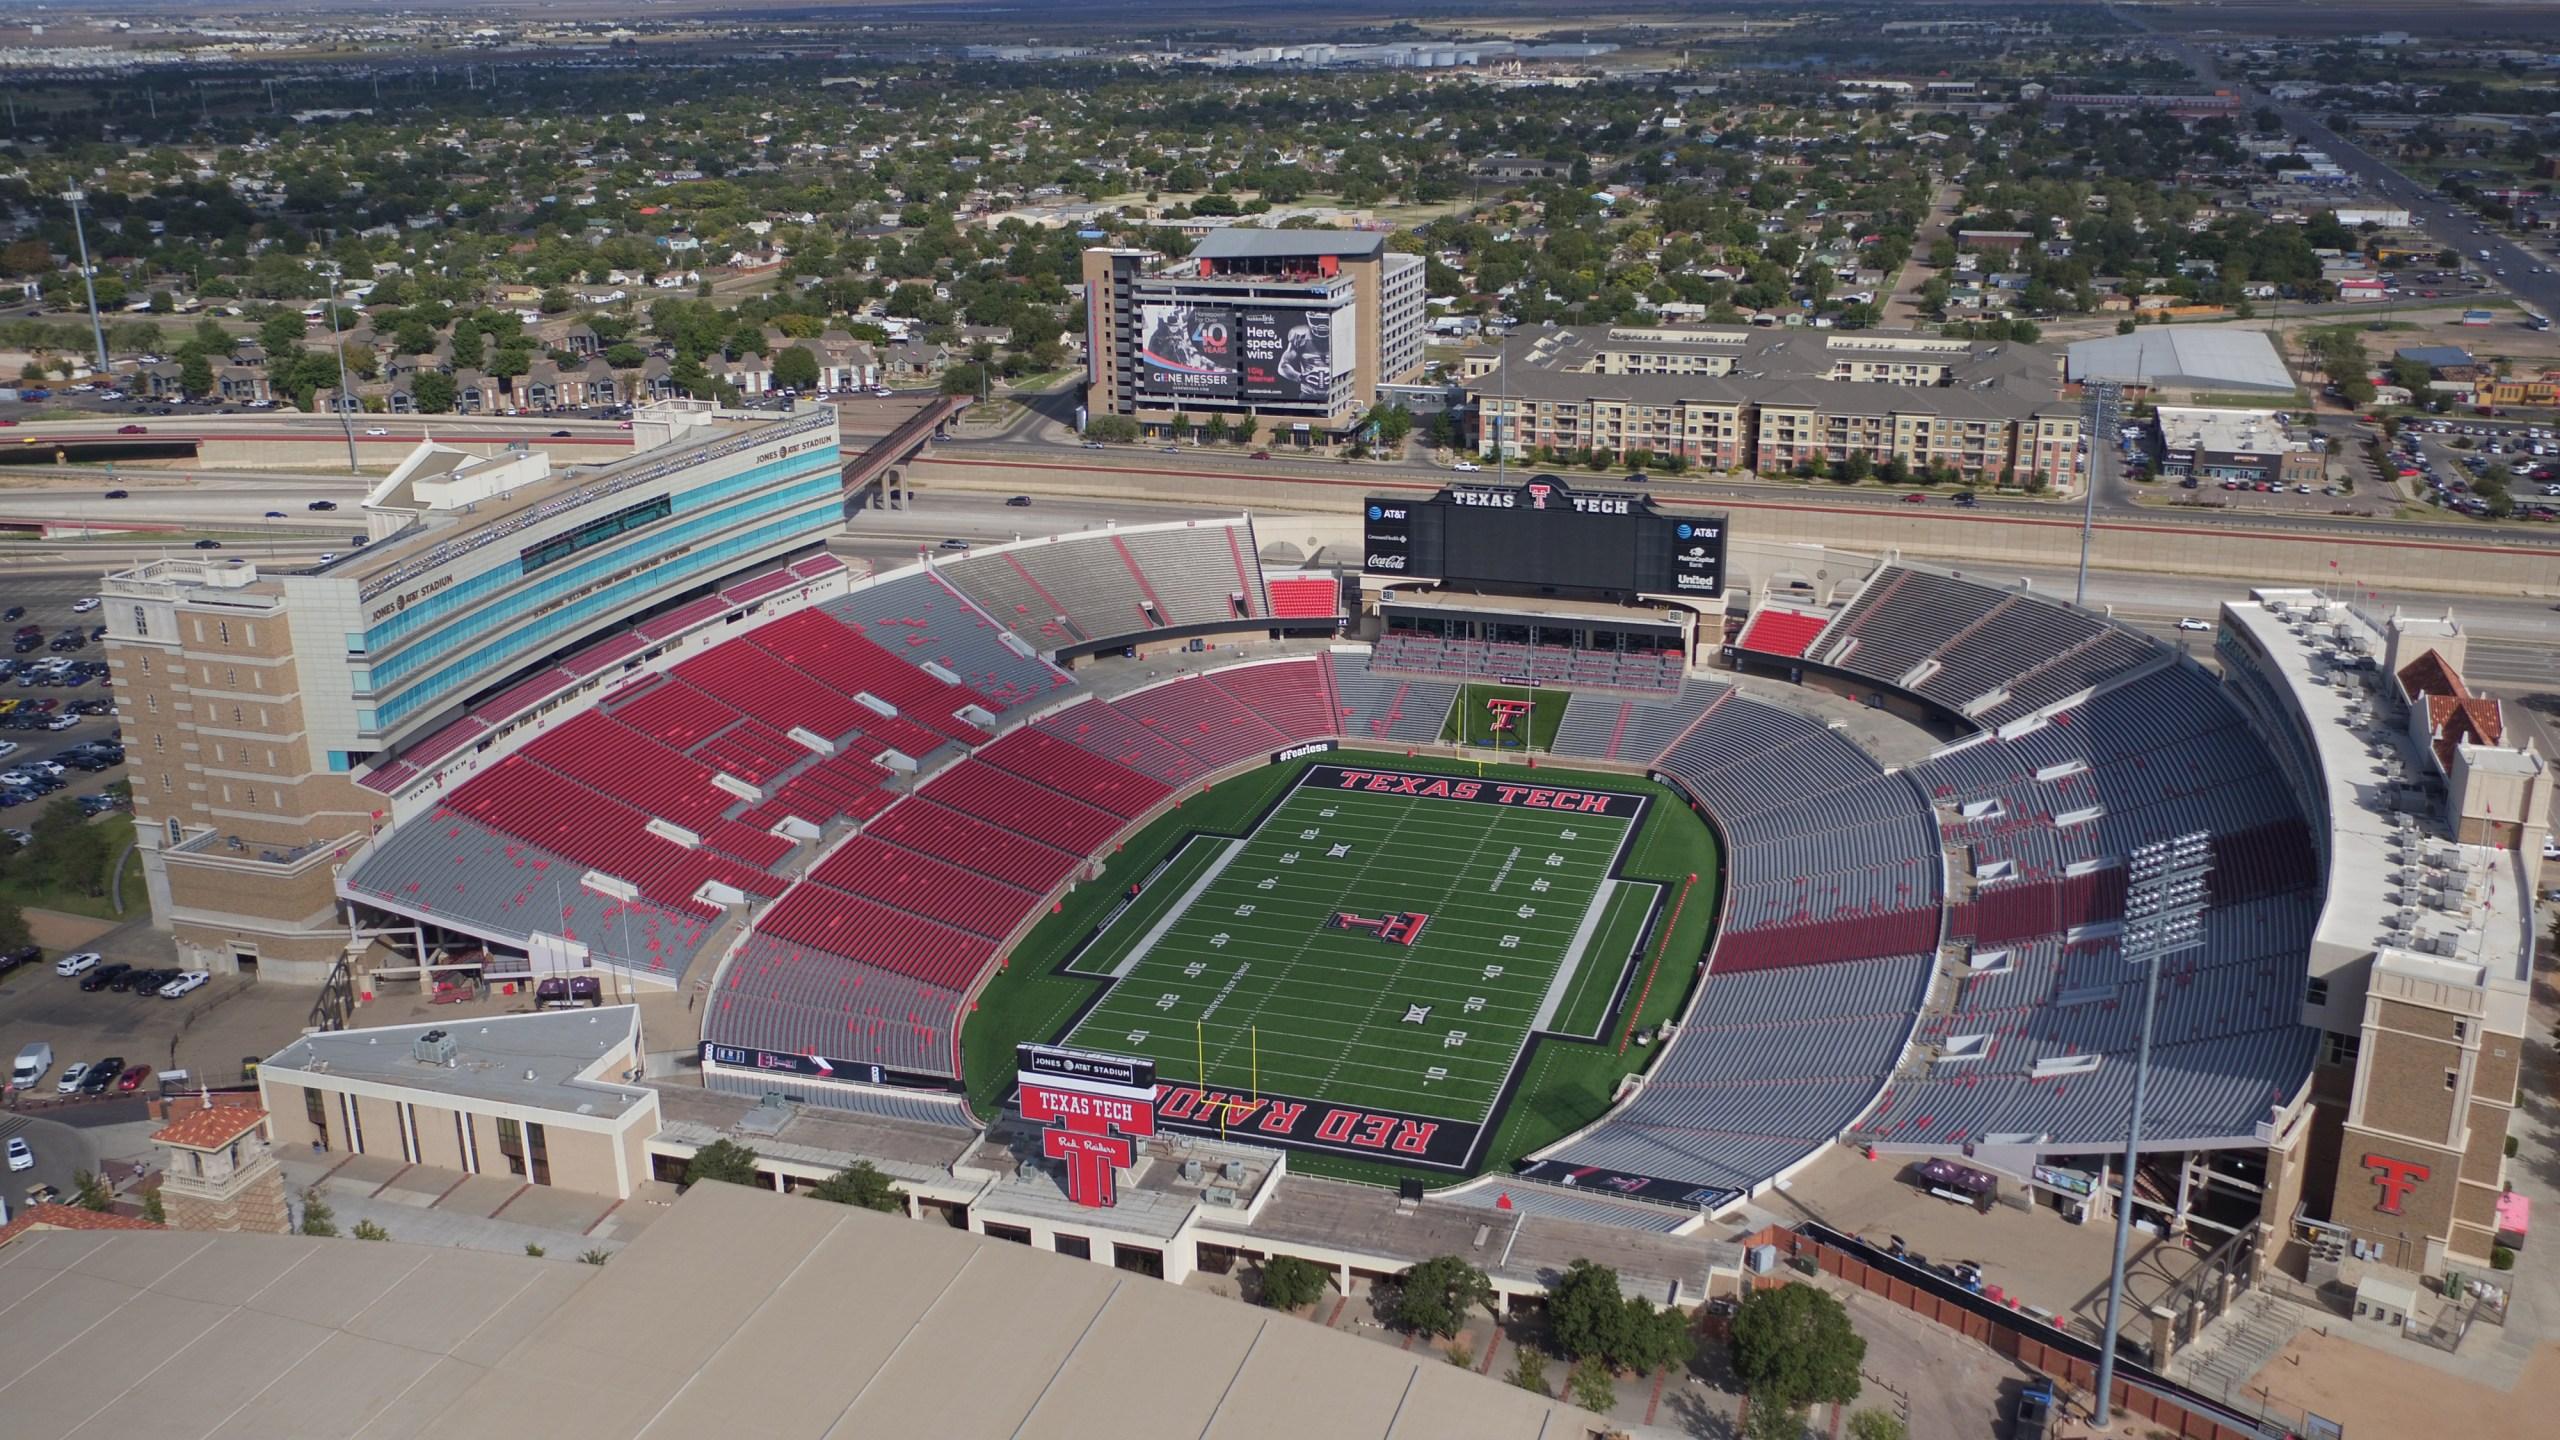 Texas Tech Football Schedule 2020.Texas Tech Football Schedules 2020 Game Against Alabama